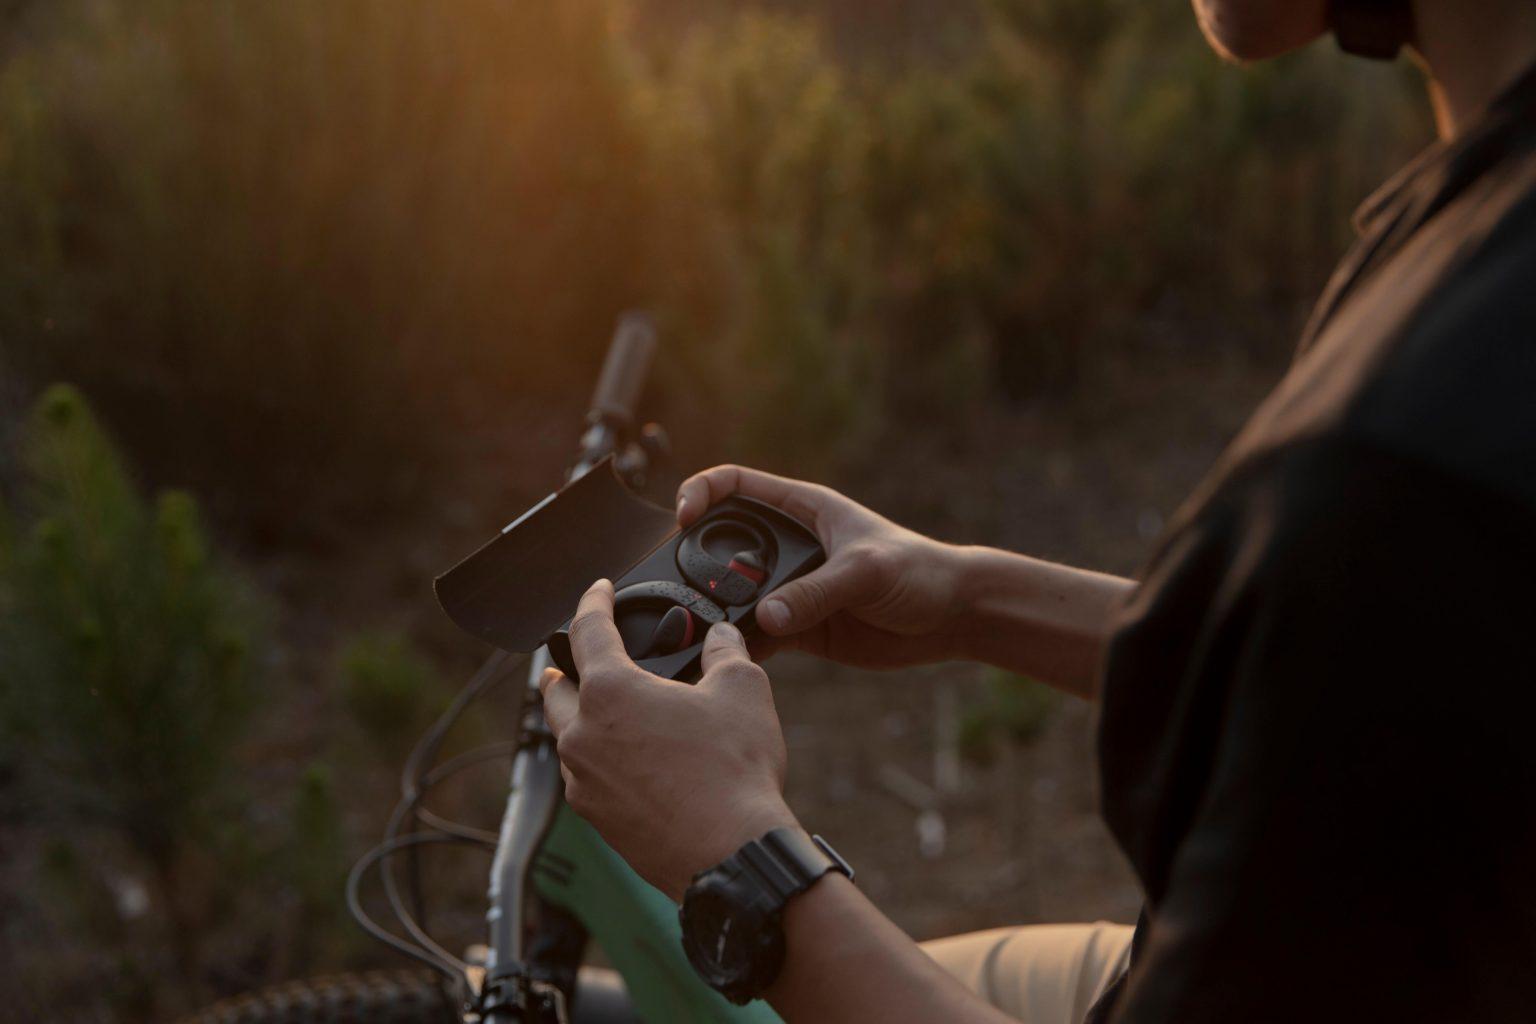 earSHOTS Bluetooth Headphones inside case with Mountain Bike